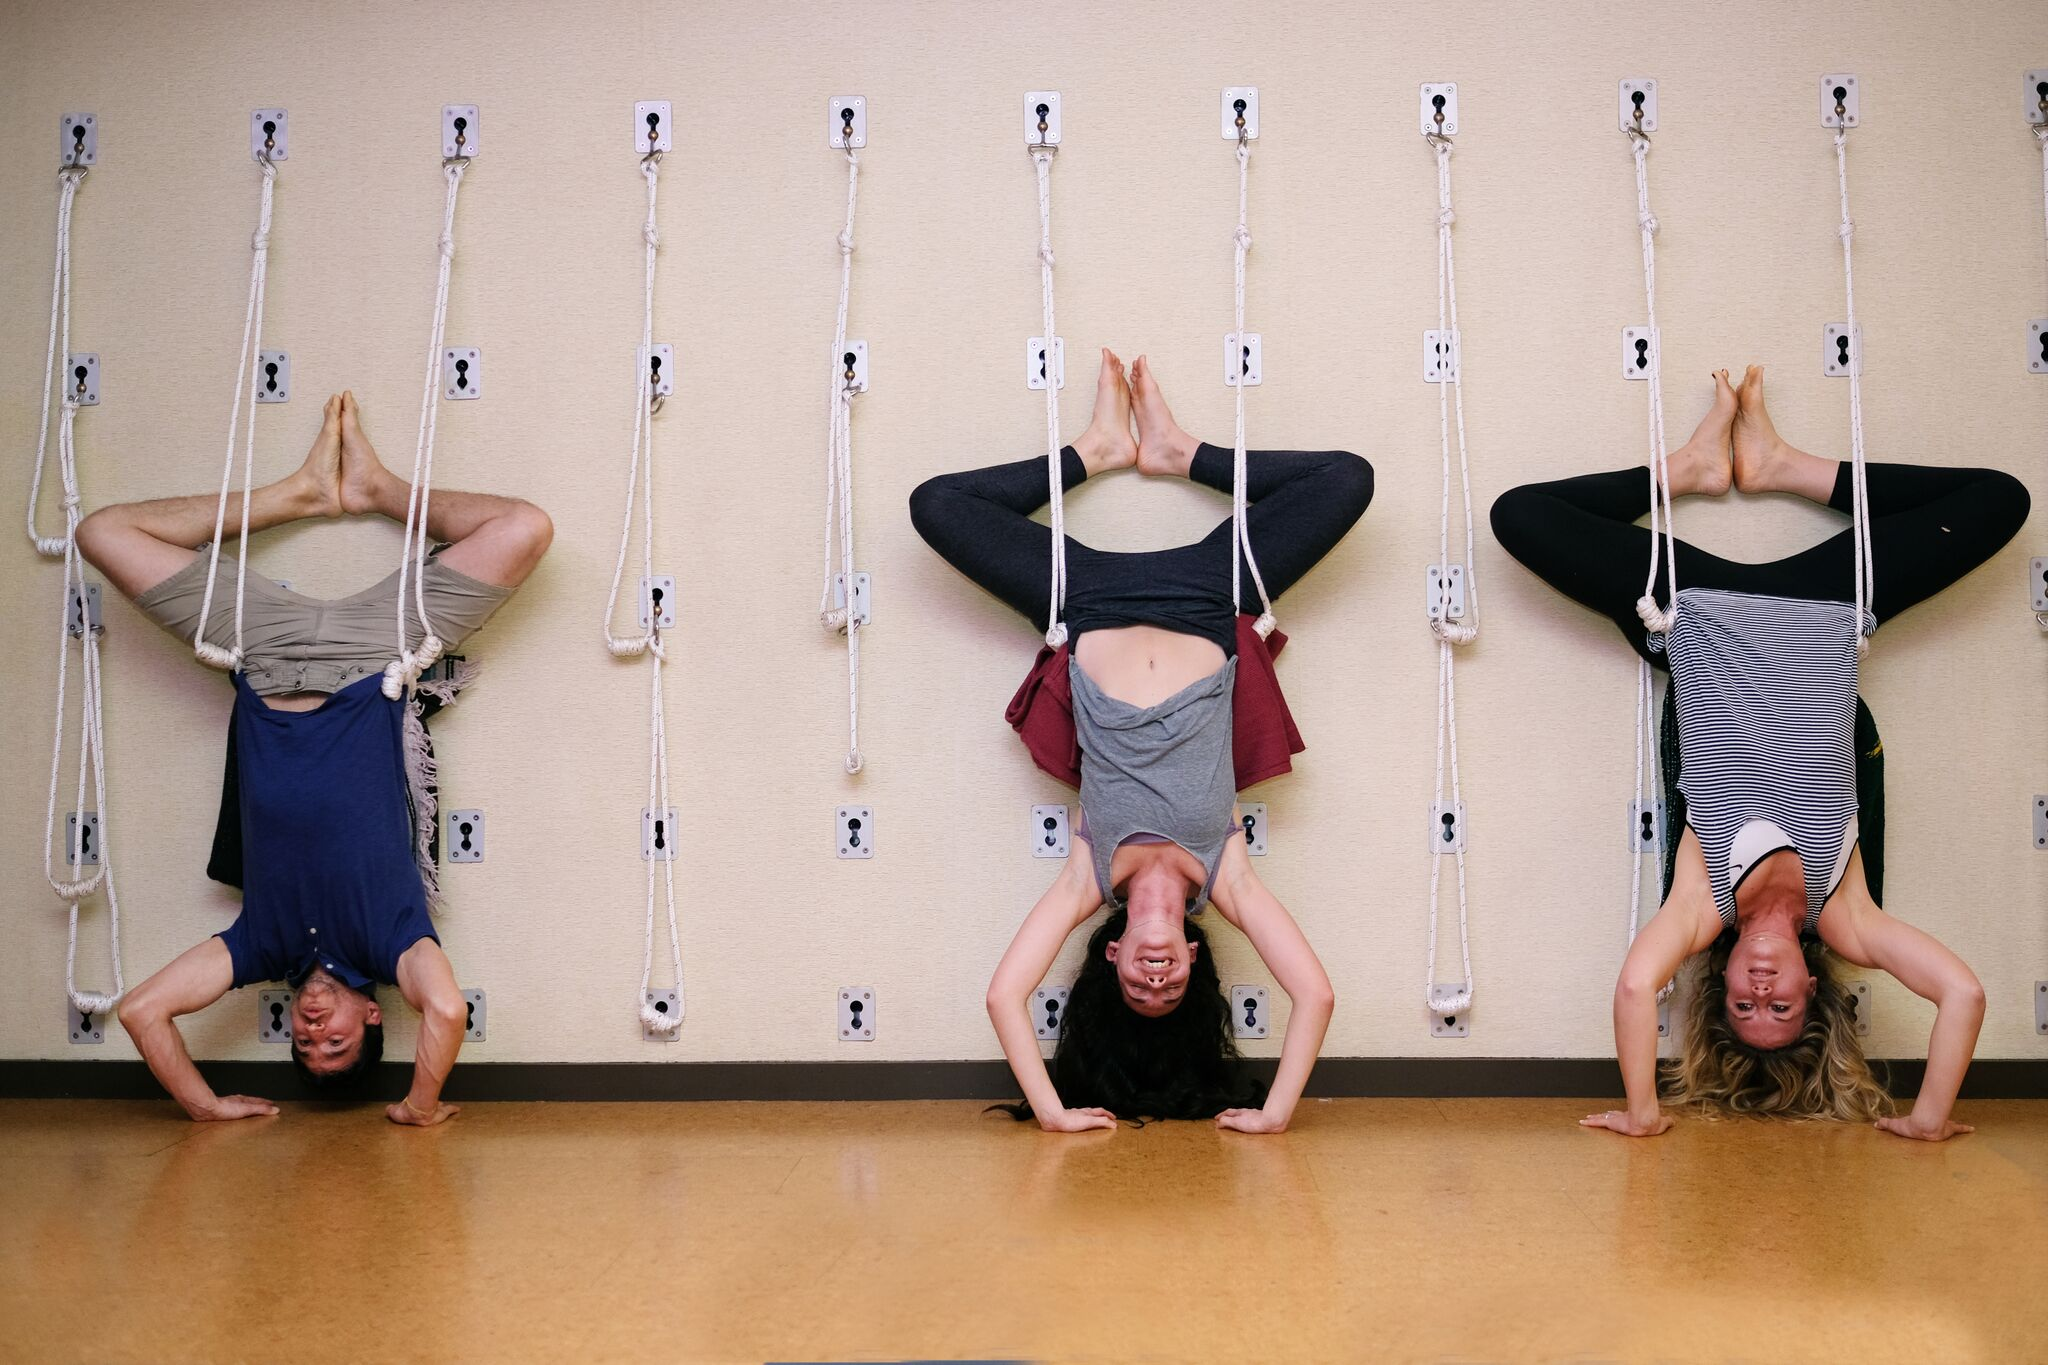 PYI_Prema_Yoga_Institute_testimonials_03.JPG